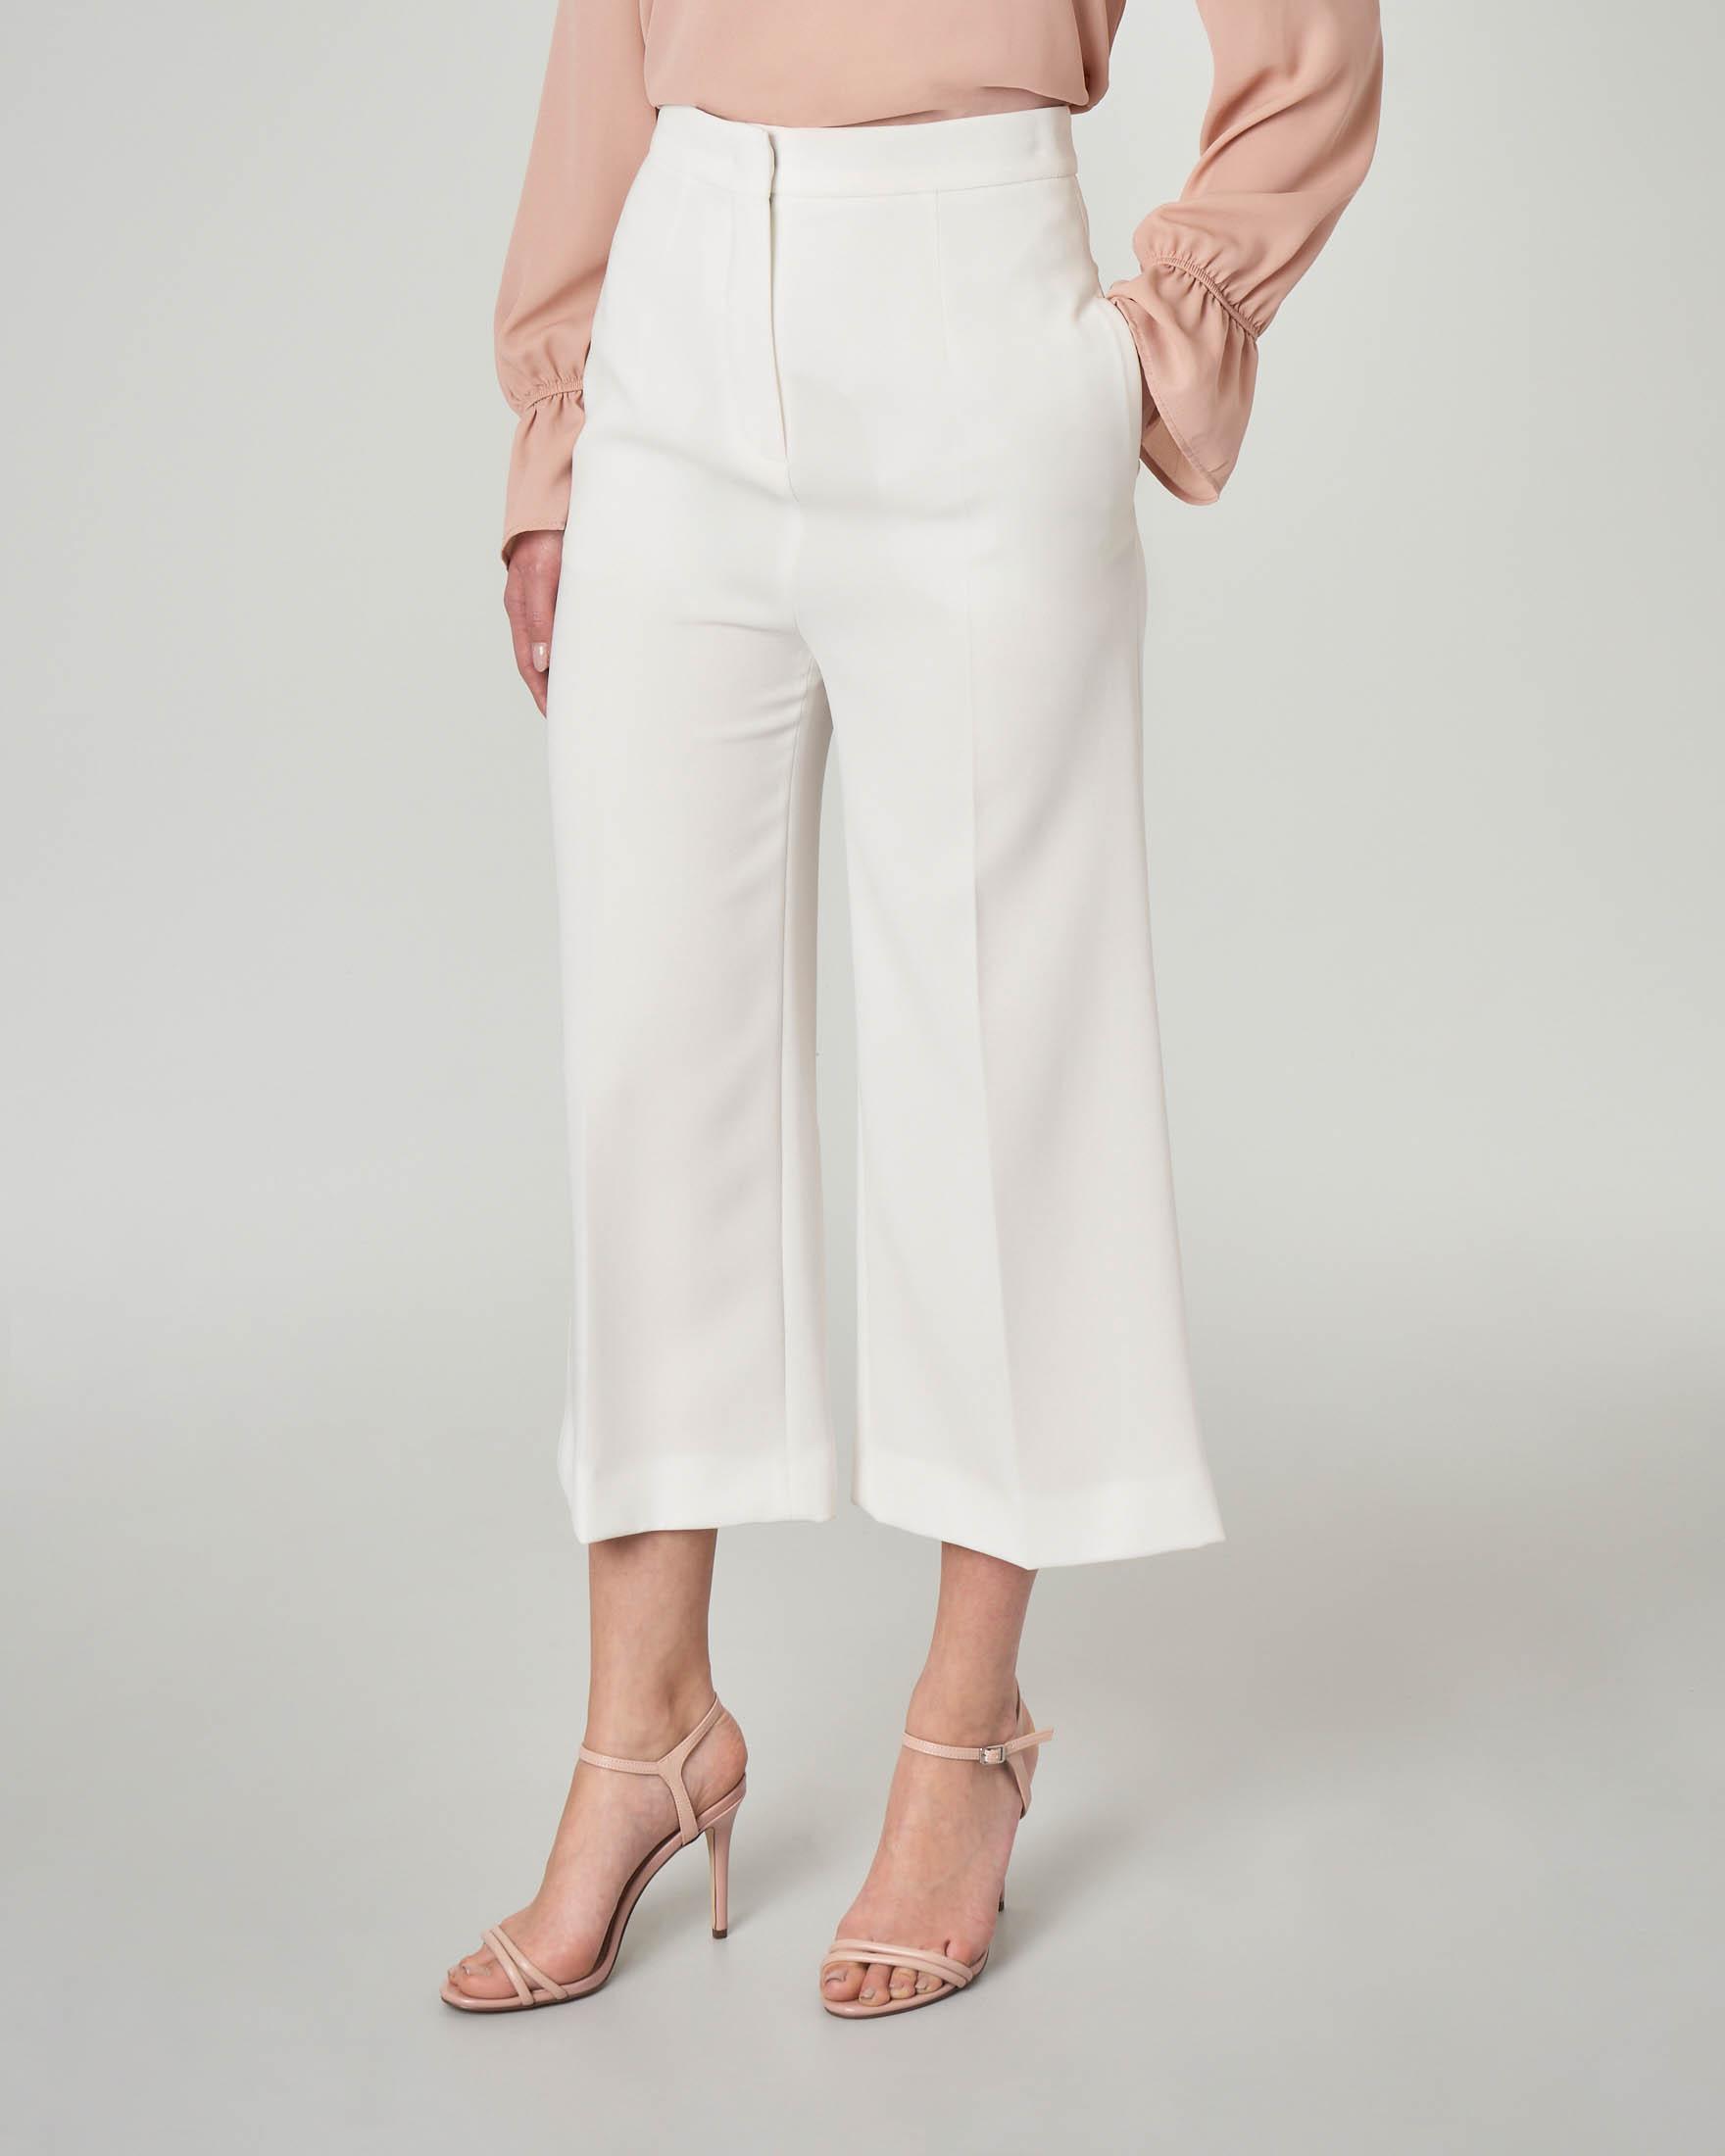 Pantaloni culotte in cady color bianco